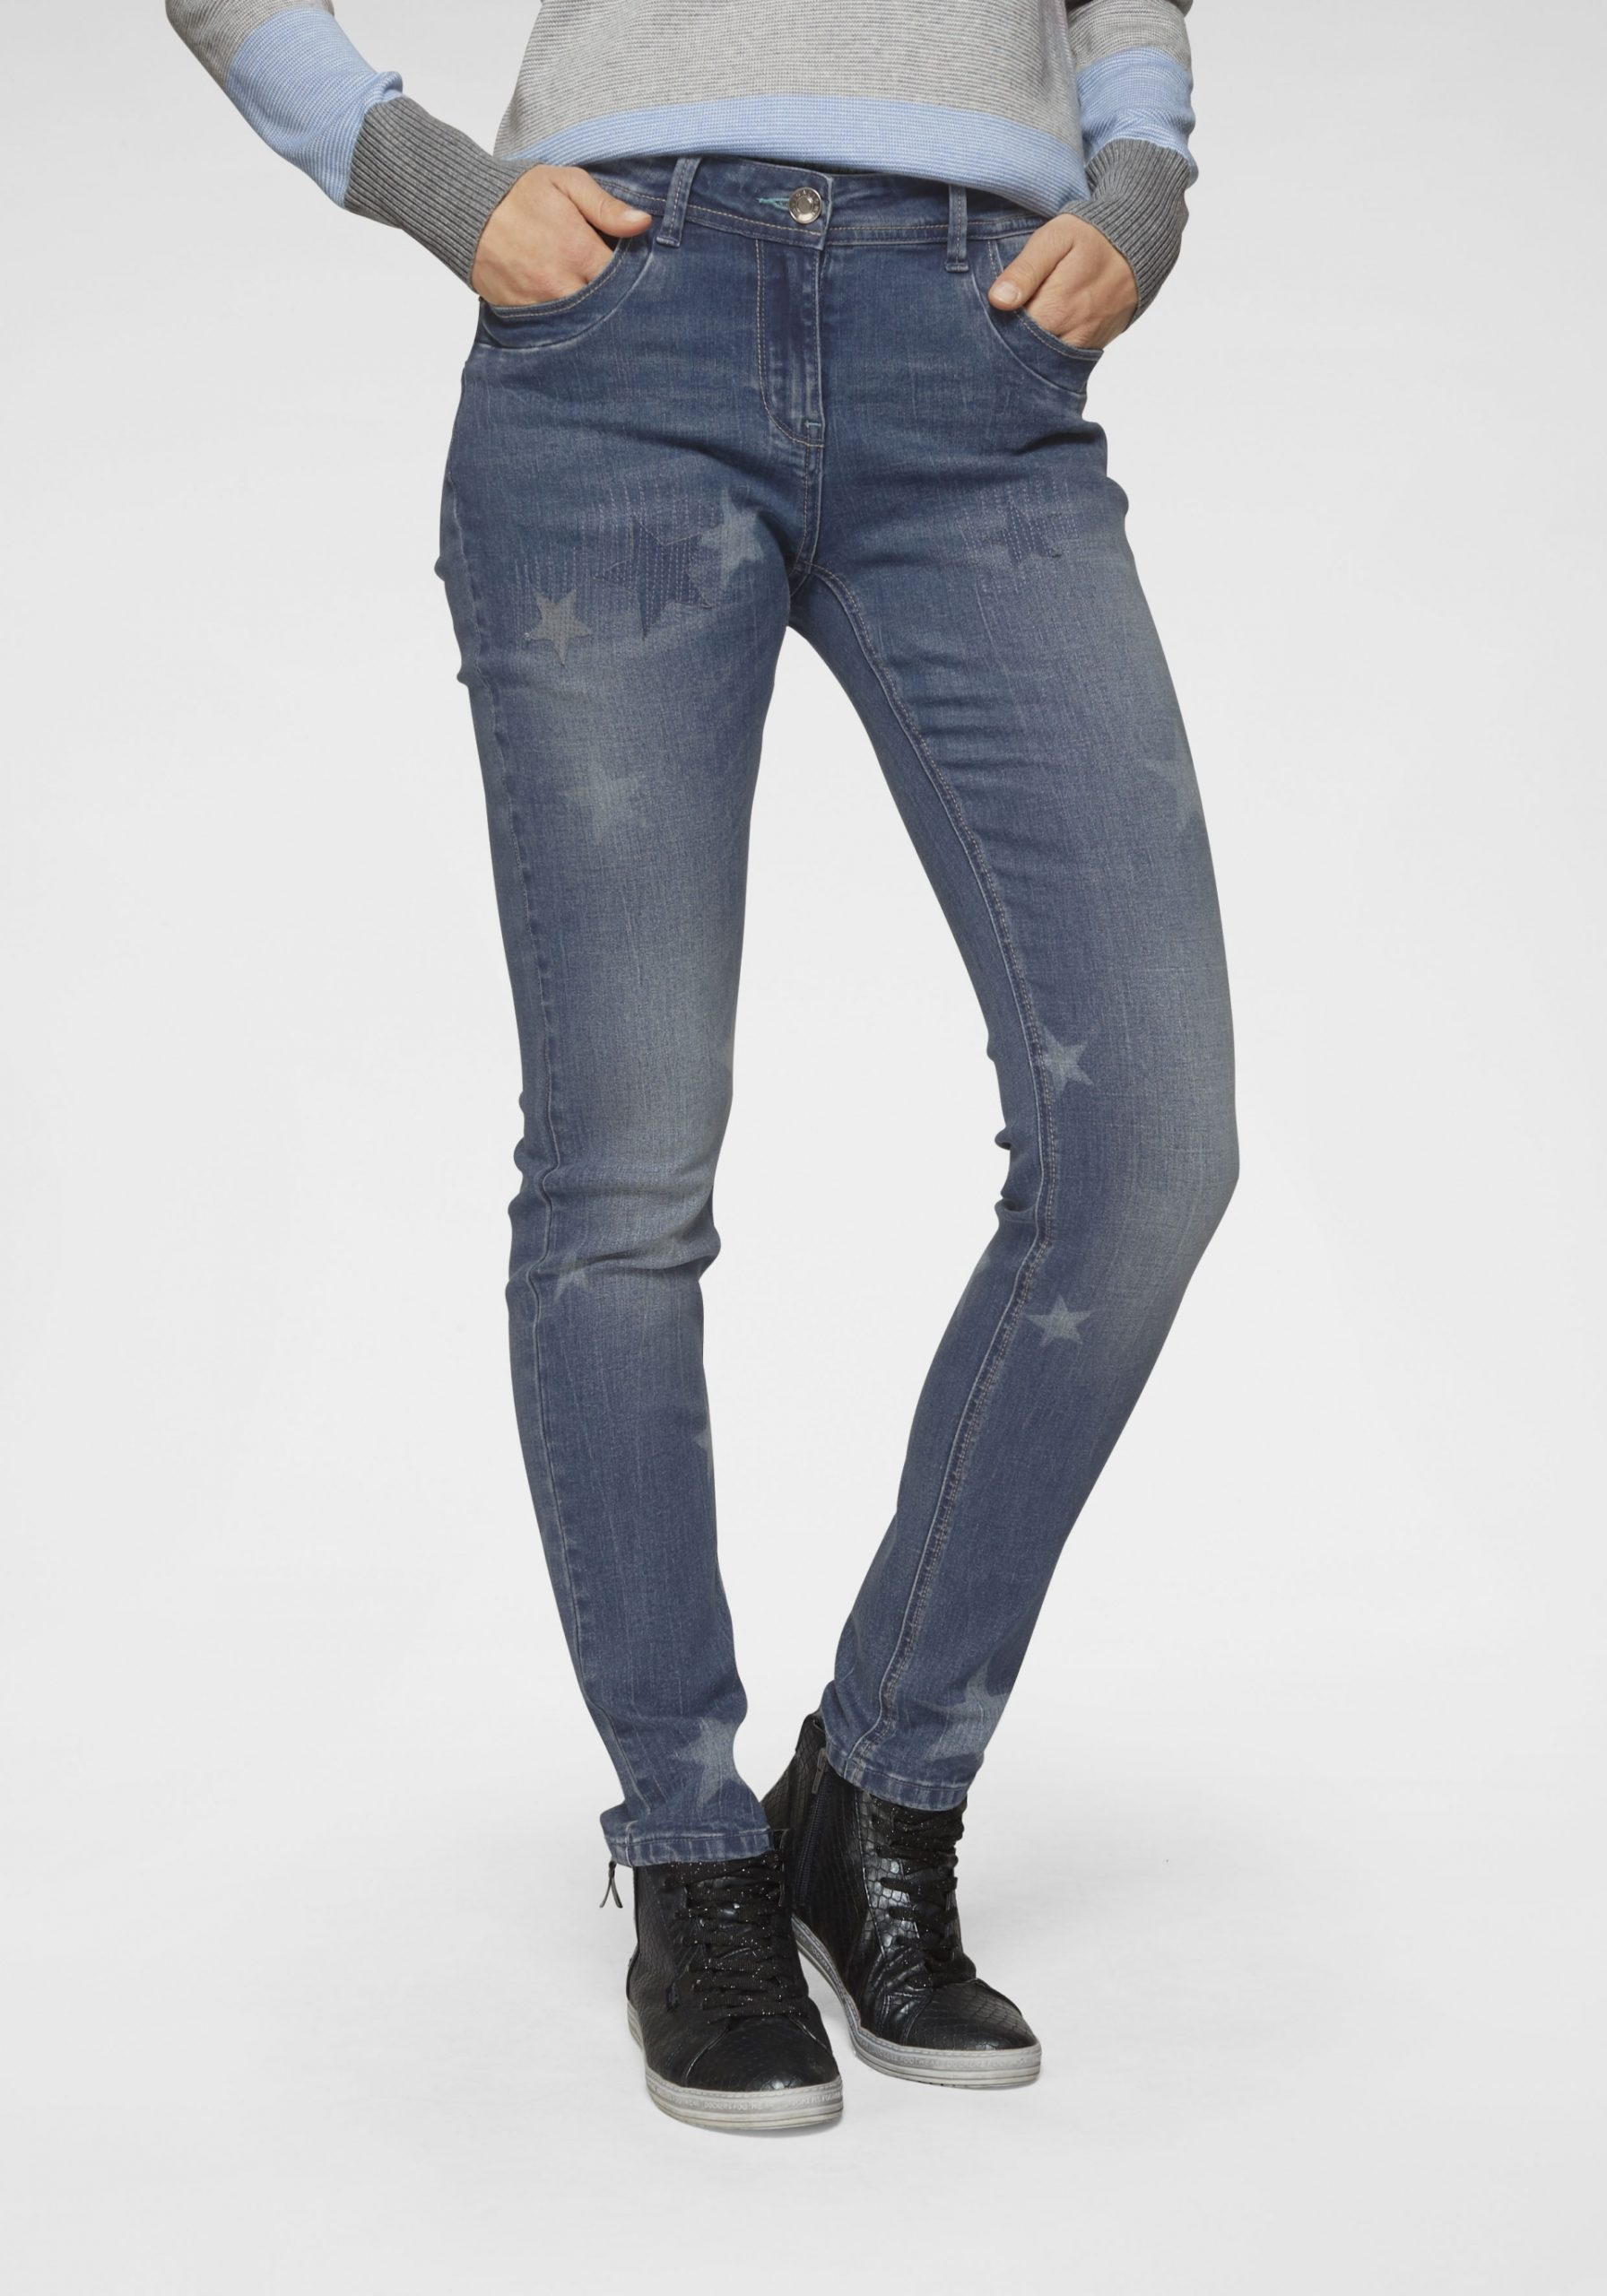 Damen Schmale Jeans mit Sternenprint dunkelblau